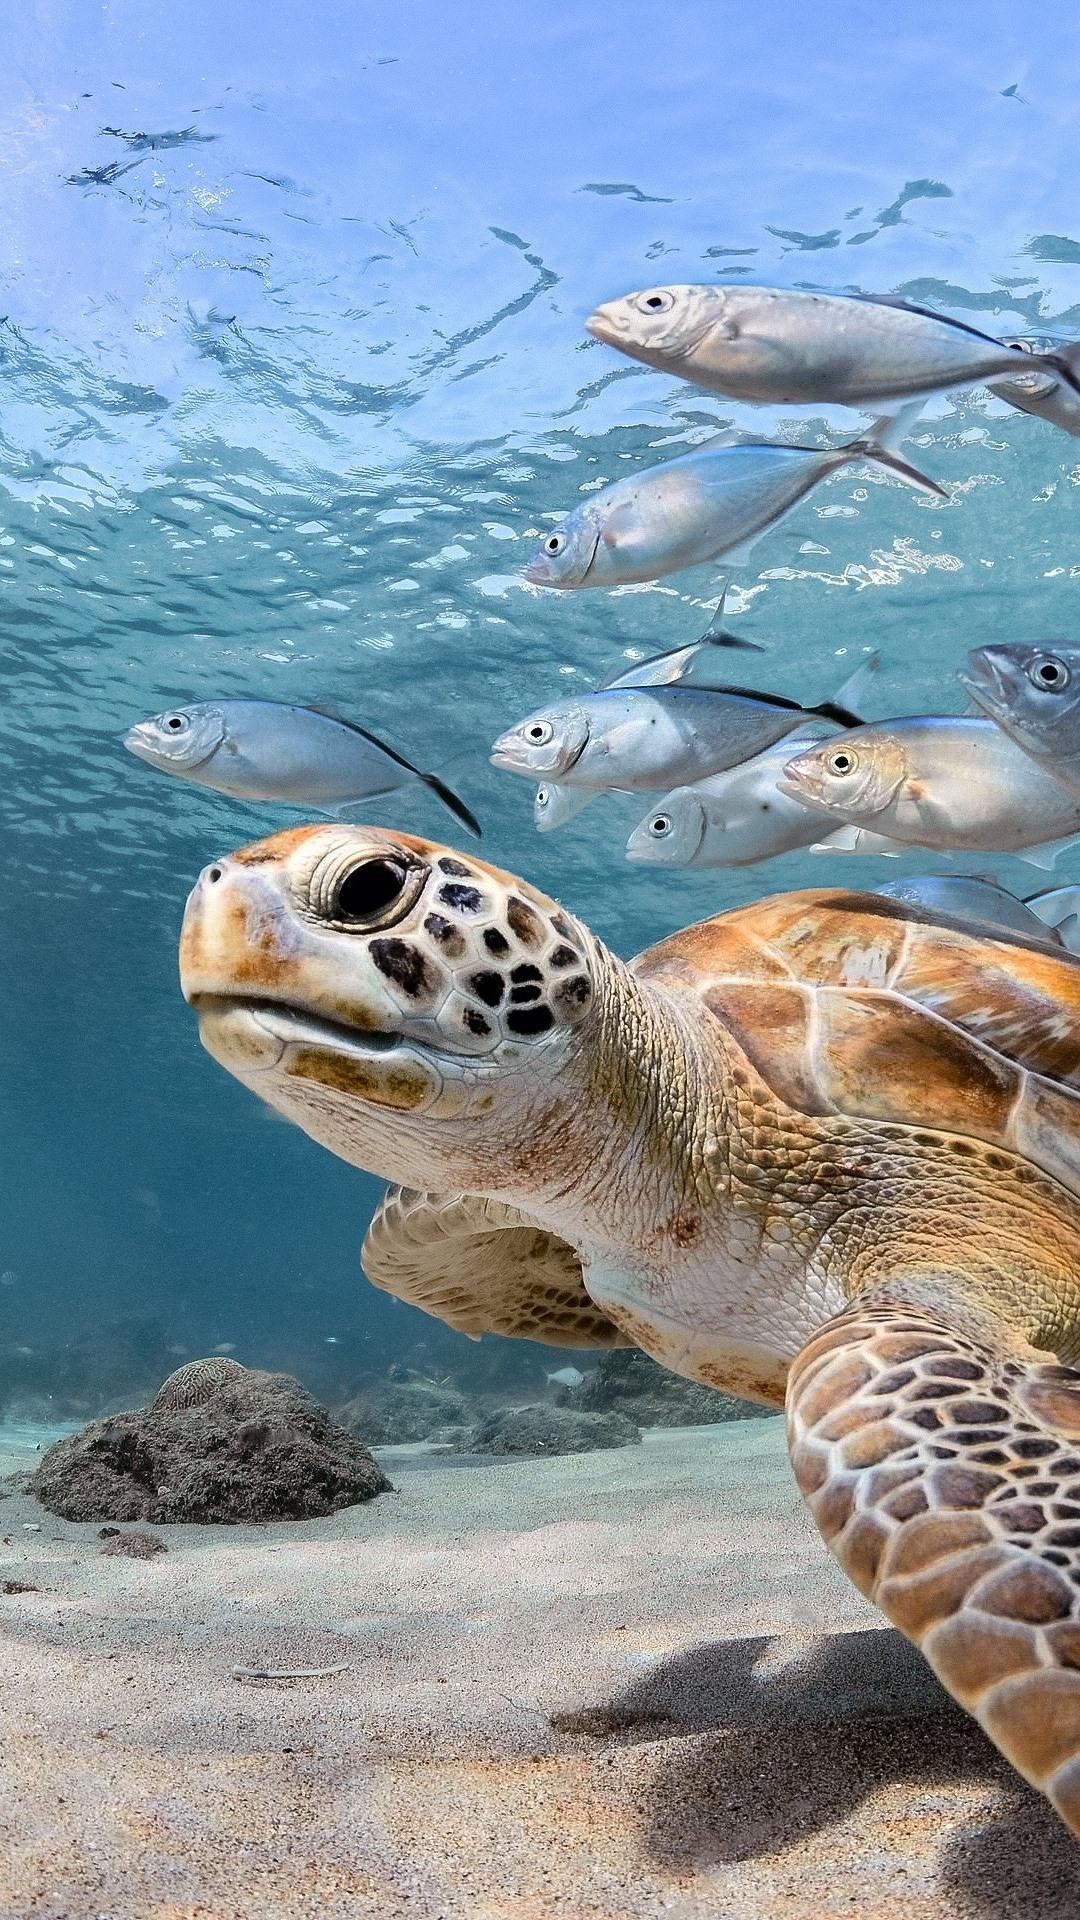 Turtle And Fish Sea Underwater 1080x1920 Iphone 8 7 6 6s Plus